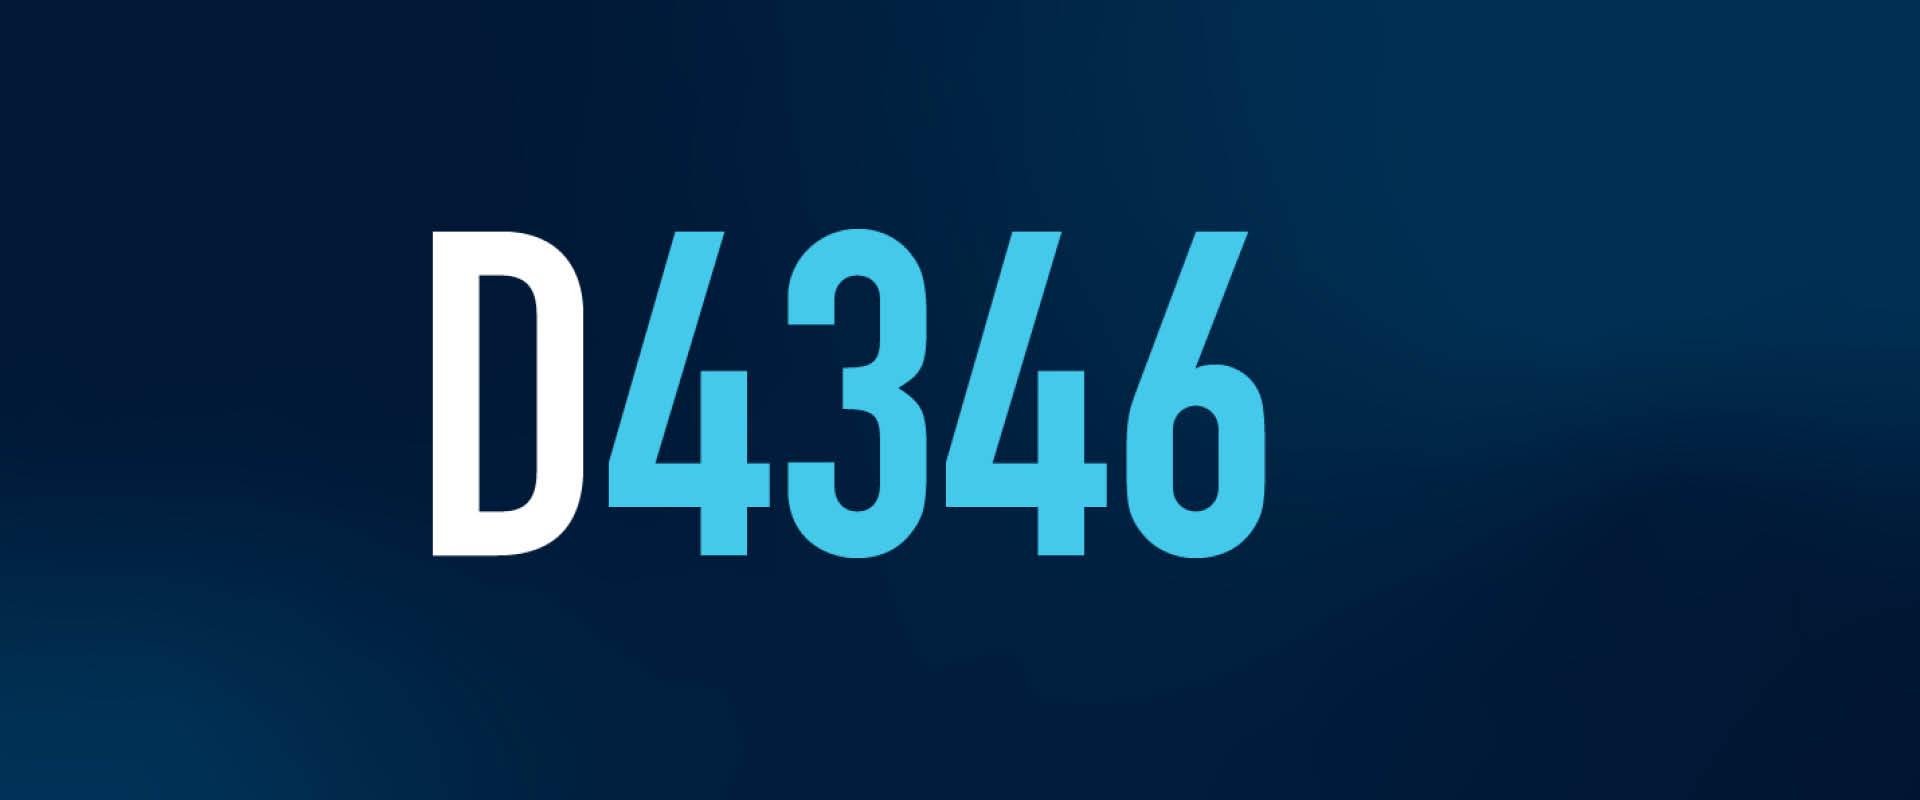 145 D4346